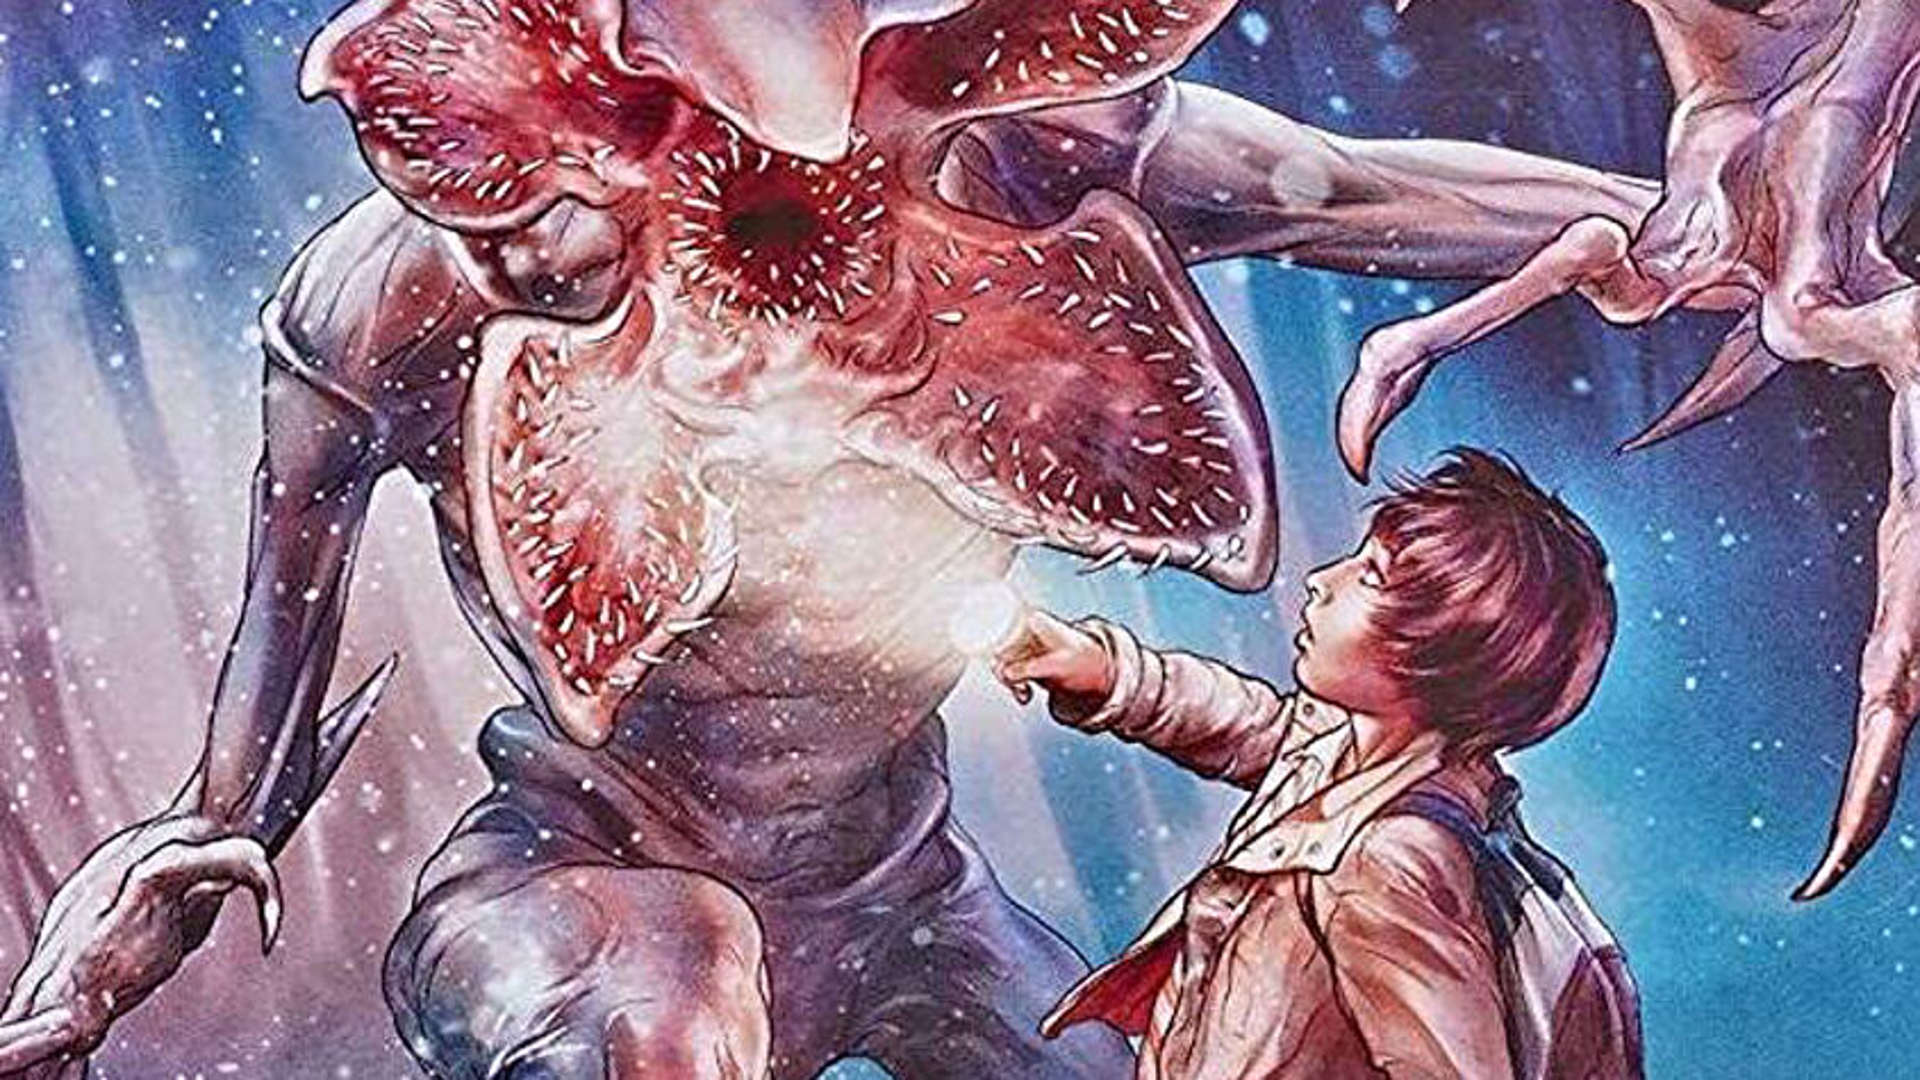 Stranger Things Dungeons & Dragons Starter Kit artwork